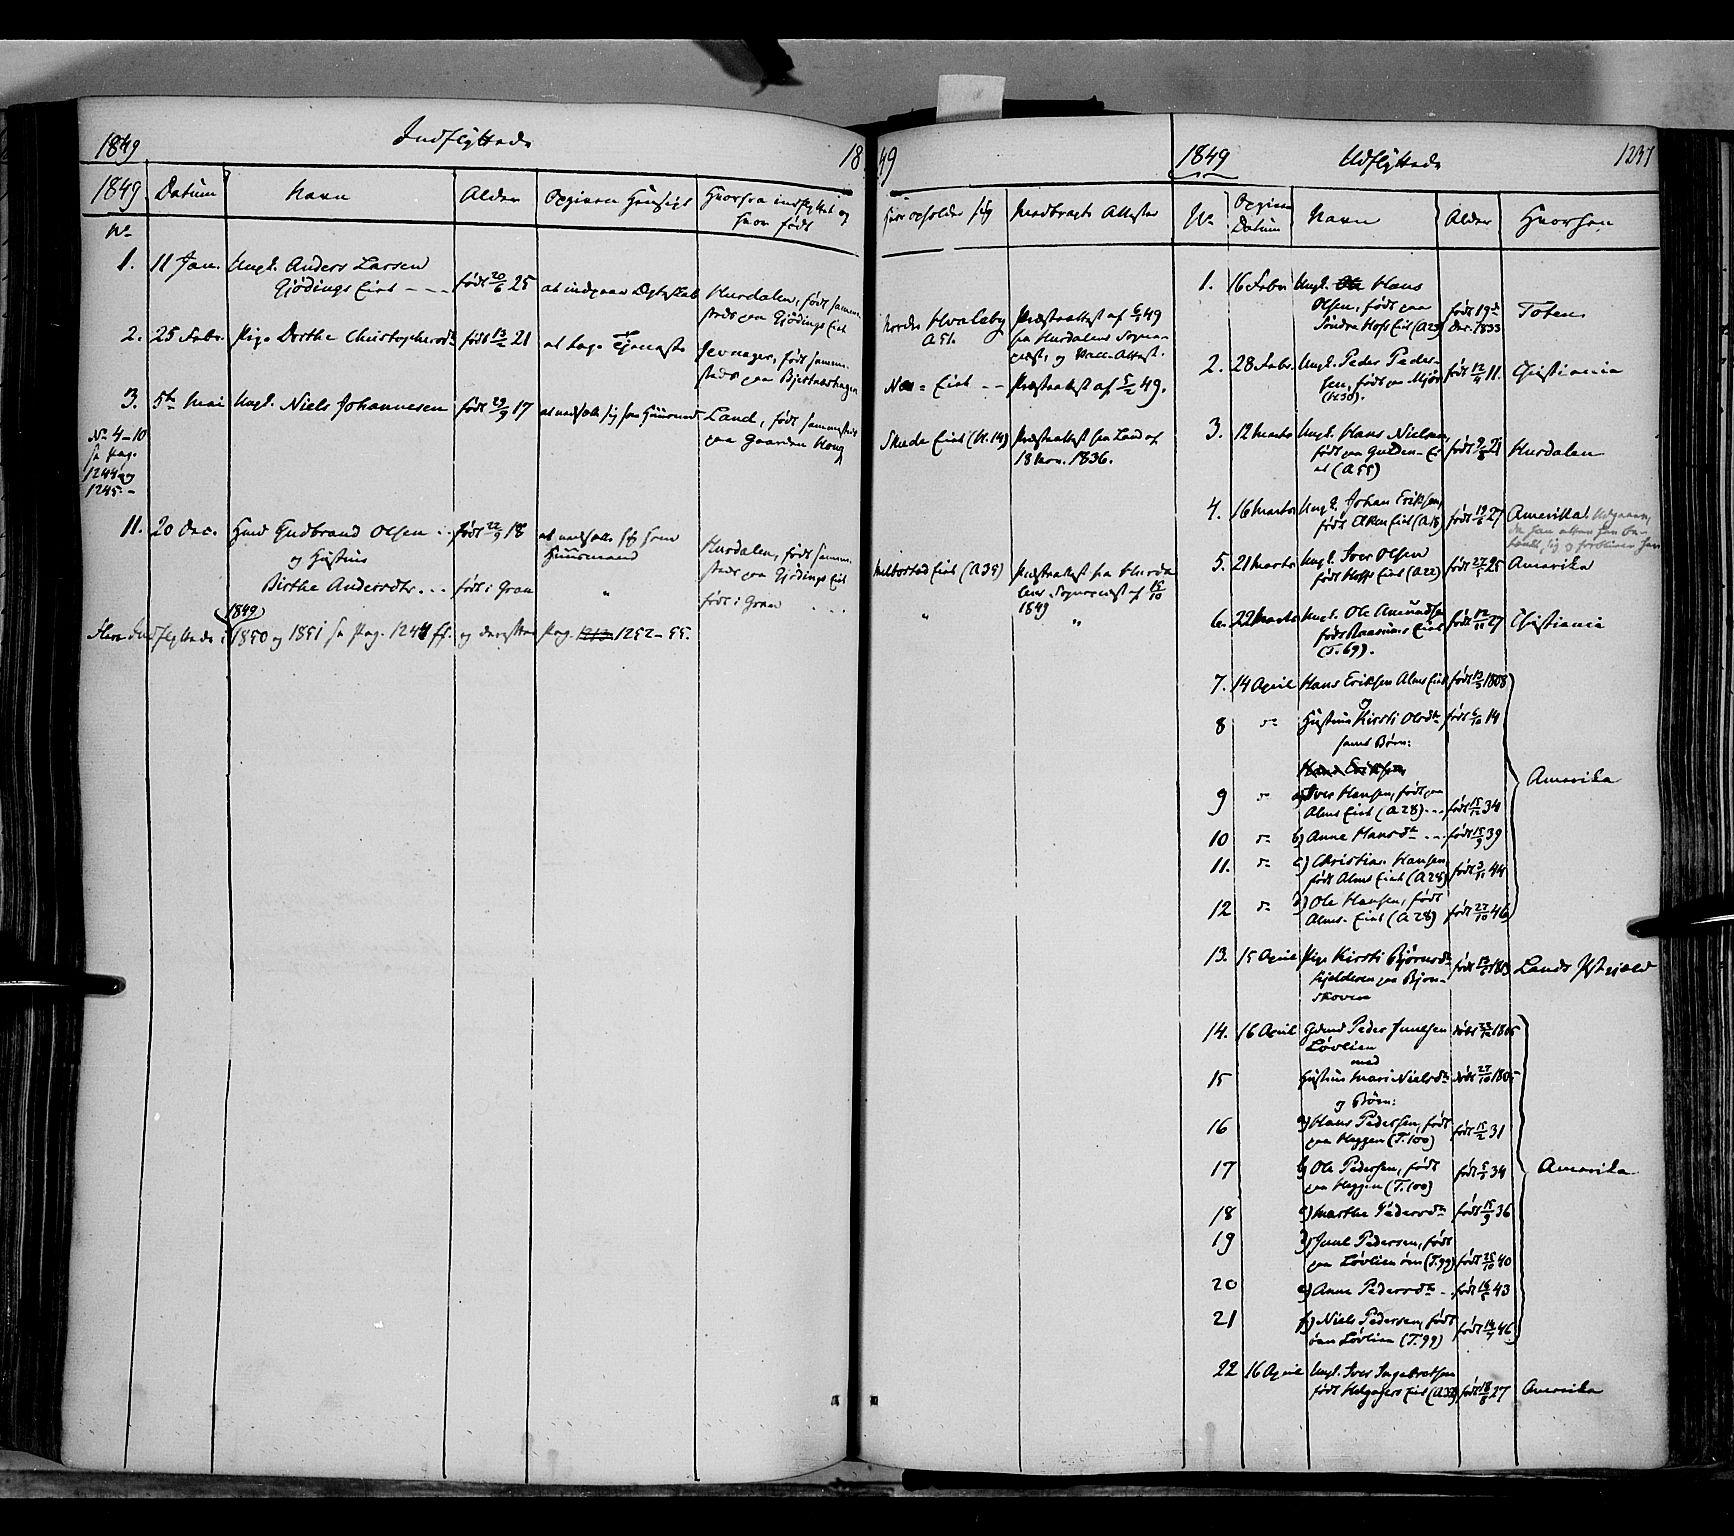 SAH, Gran prestekontor, Ministerialbok nr. 11, 1842-1856, s. 1236-1237